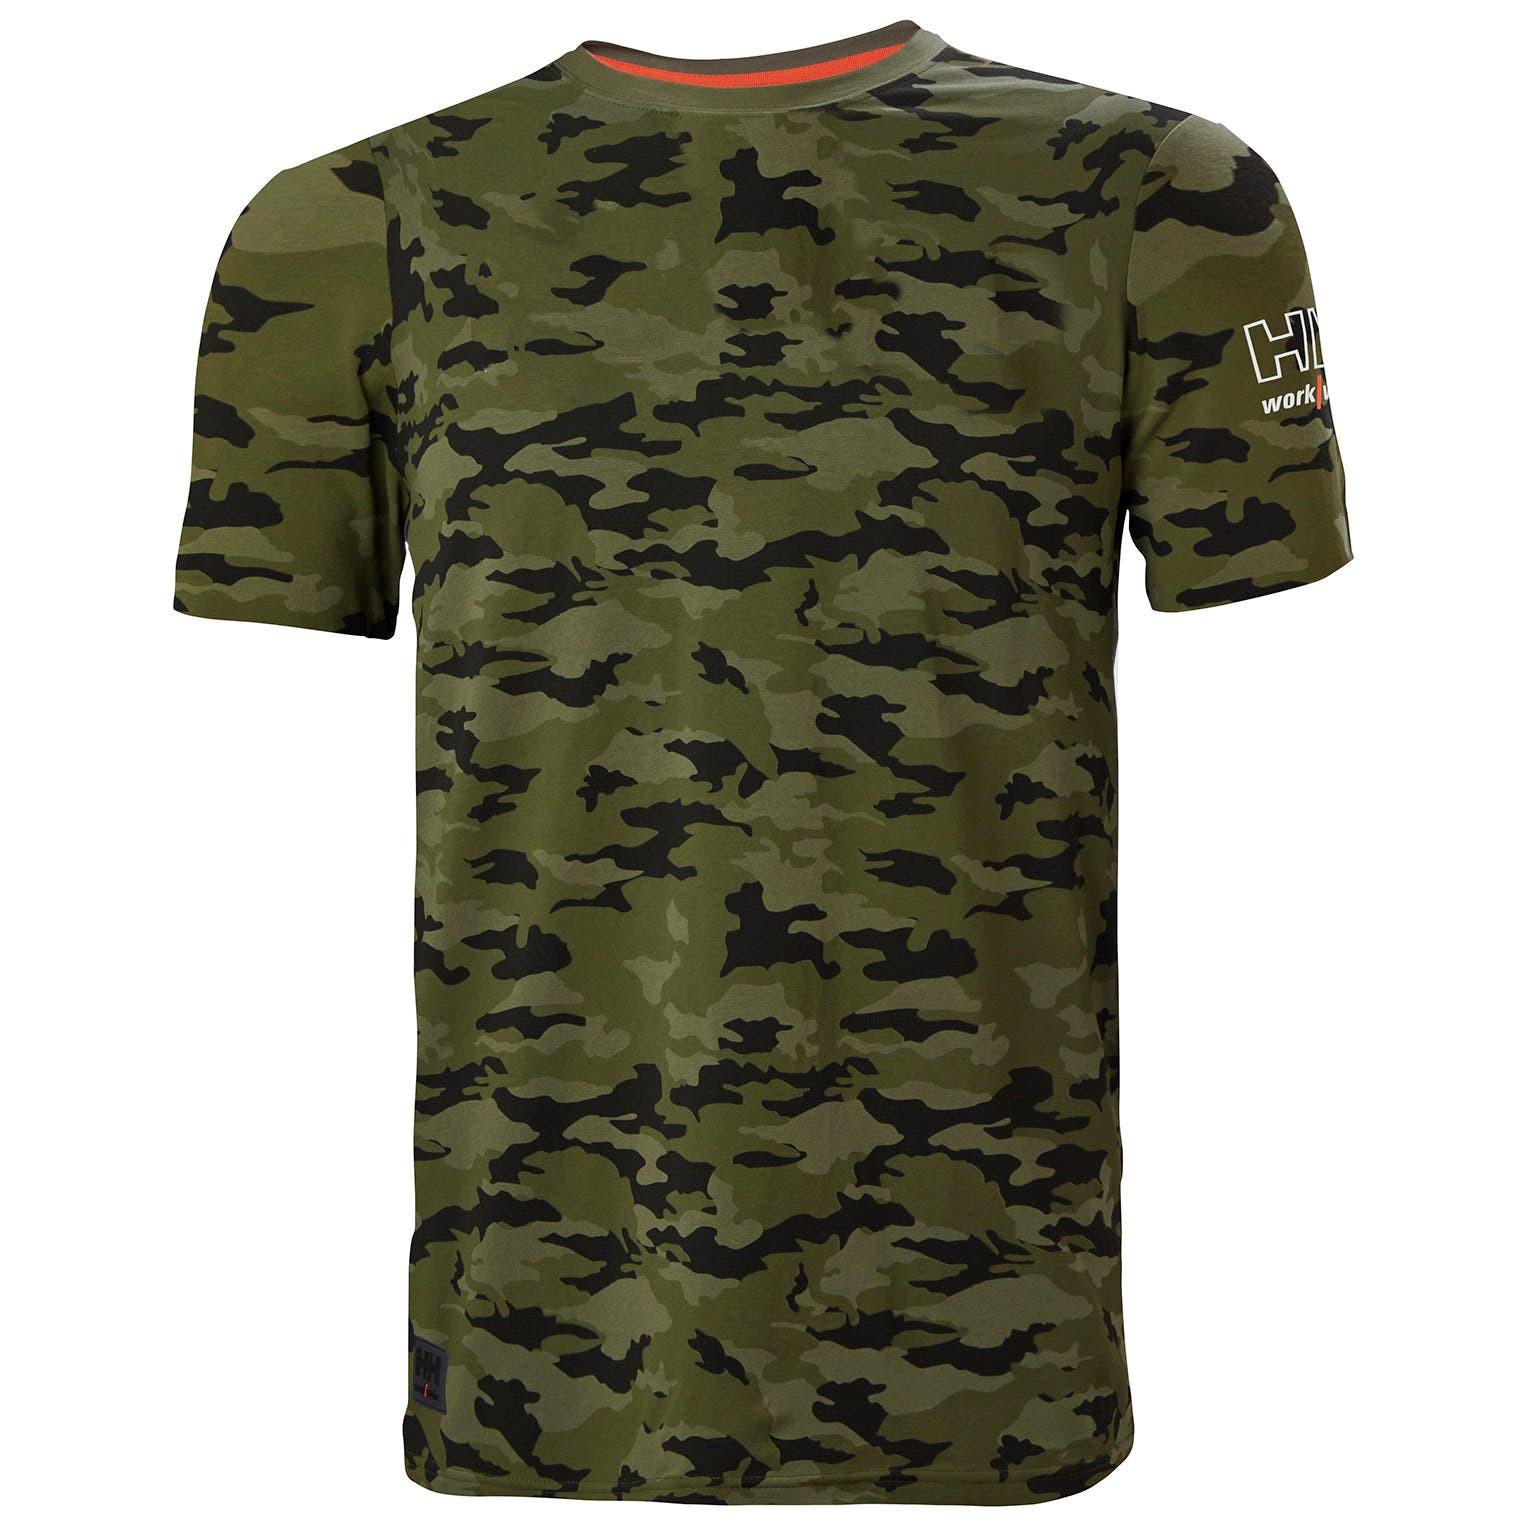 Футболка Helly Hansen Kensington T-Shirt - 79246 (Camo, S)